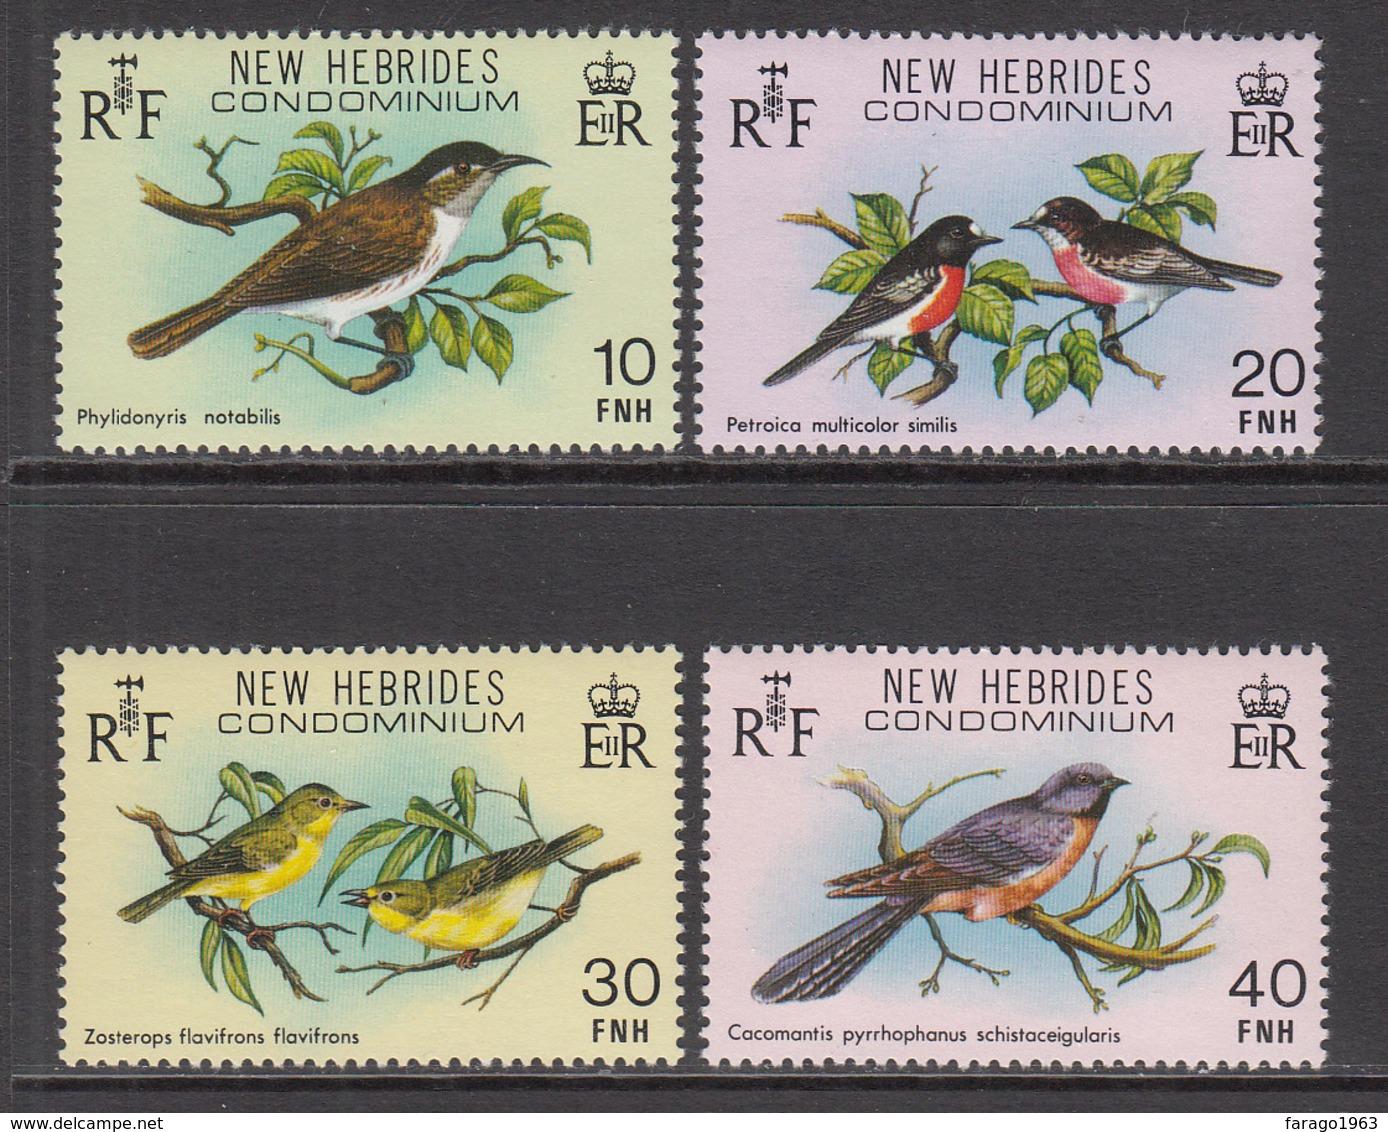 1980 New Hebrides Birds Oiseaux  Complete Set Of 4 MNH - Leyenda Inglesa